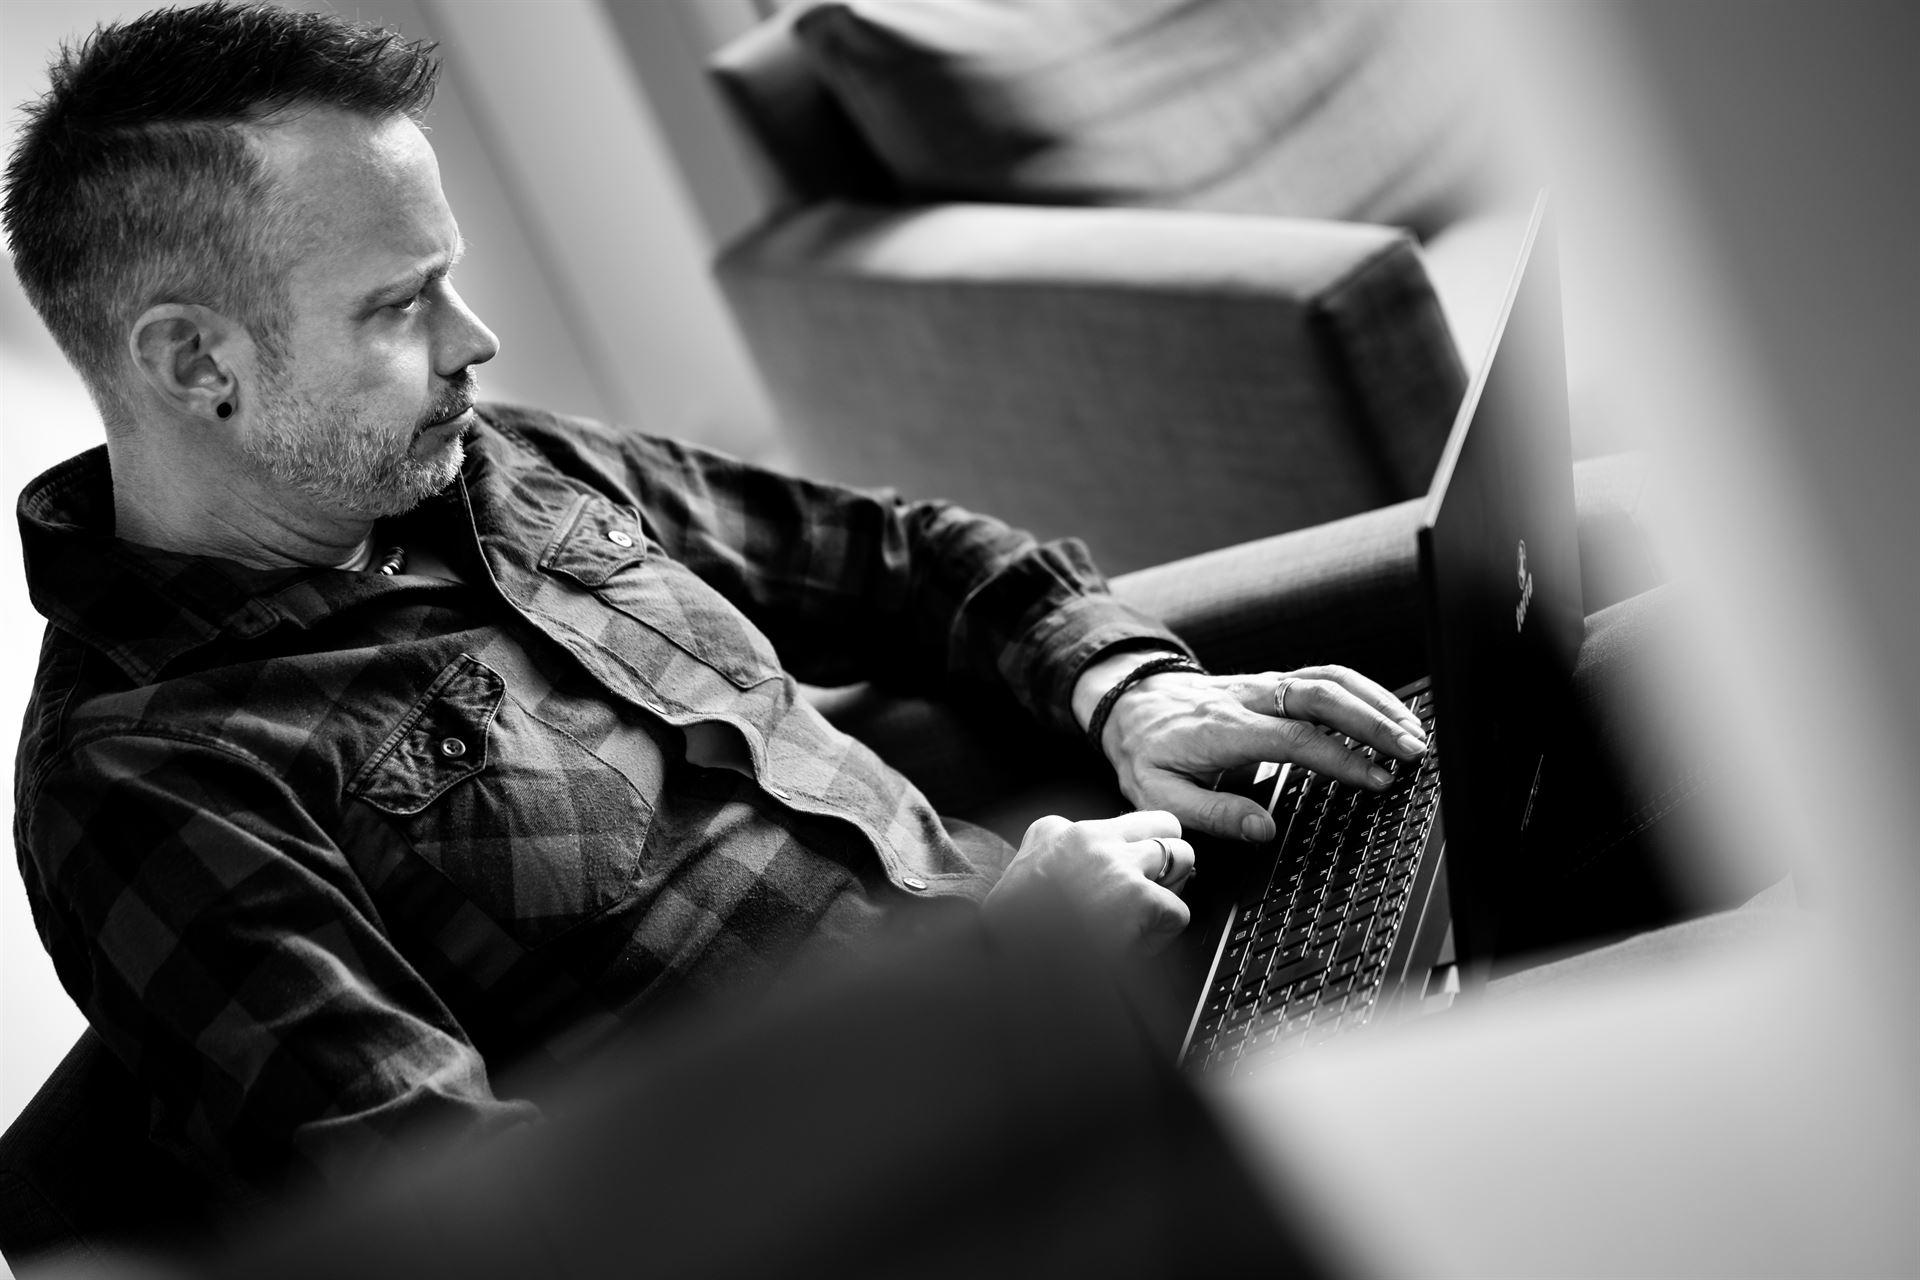 hils IT - Hils im Sessel, tippt auf Notebook